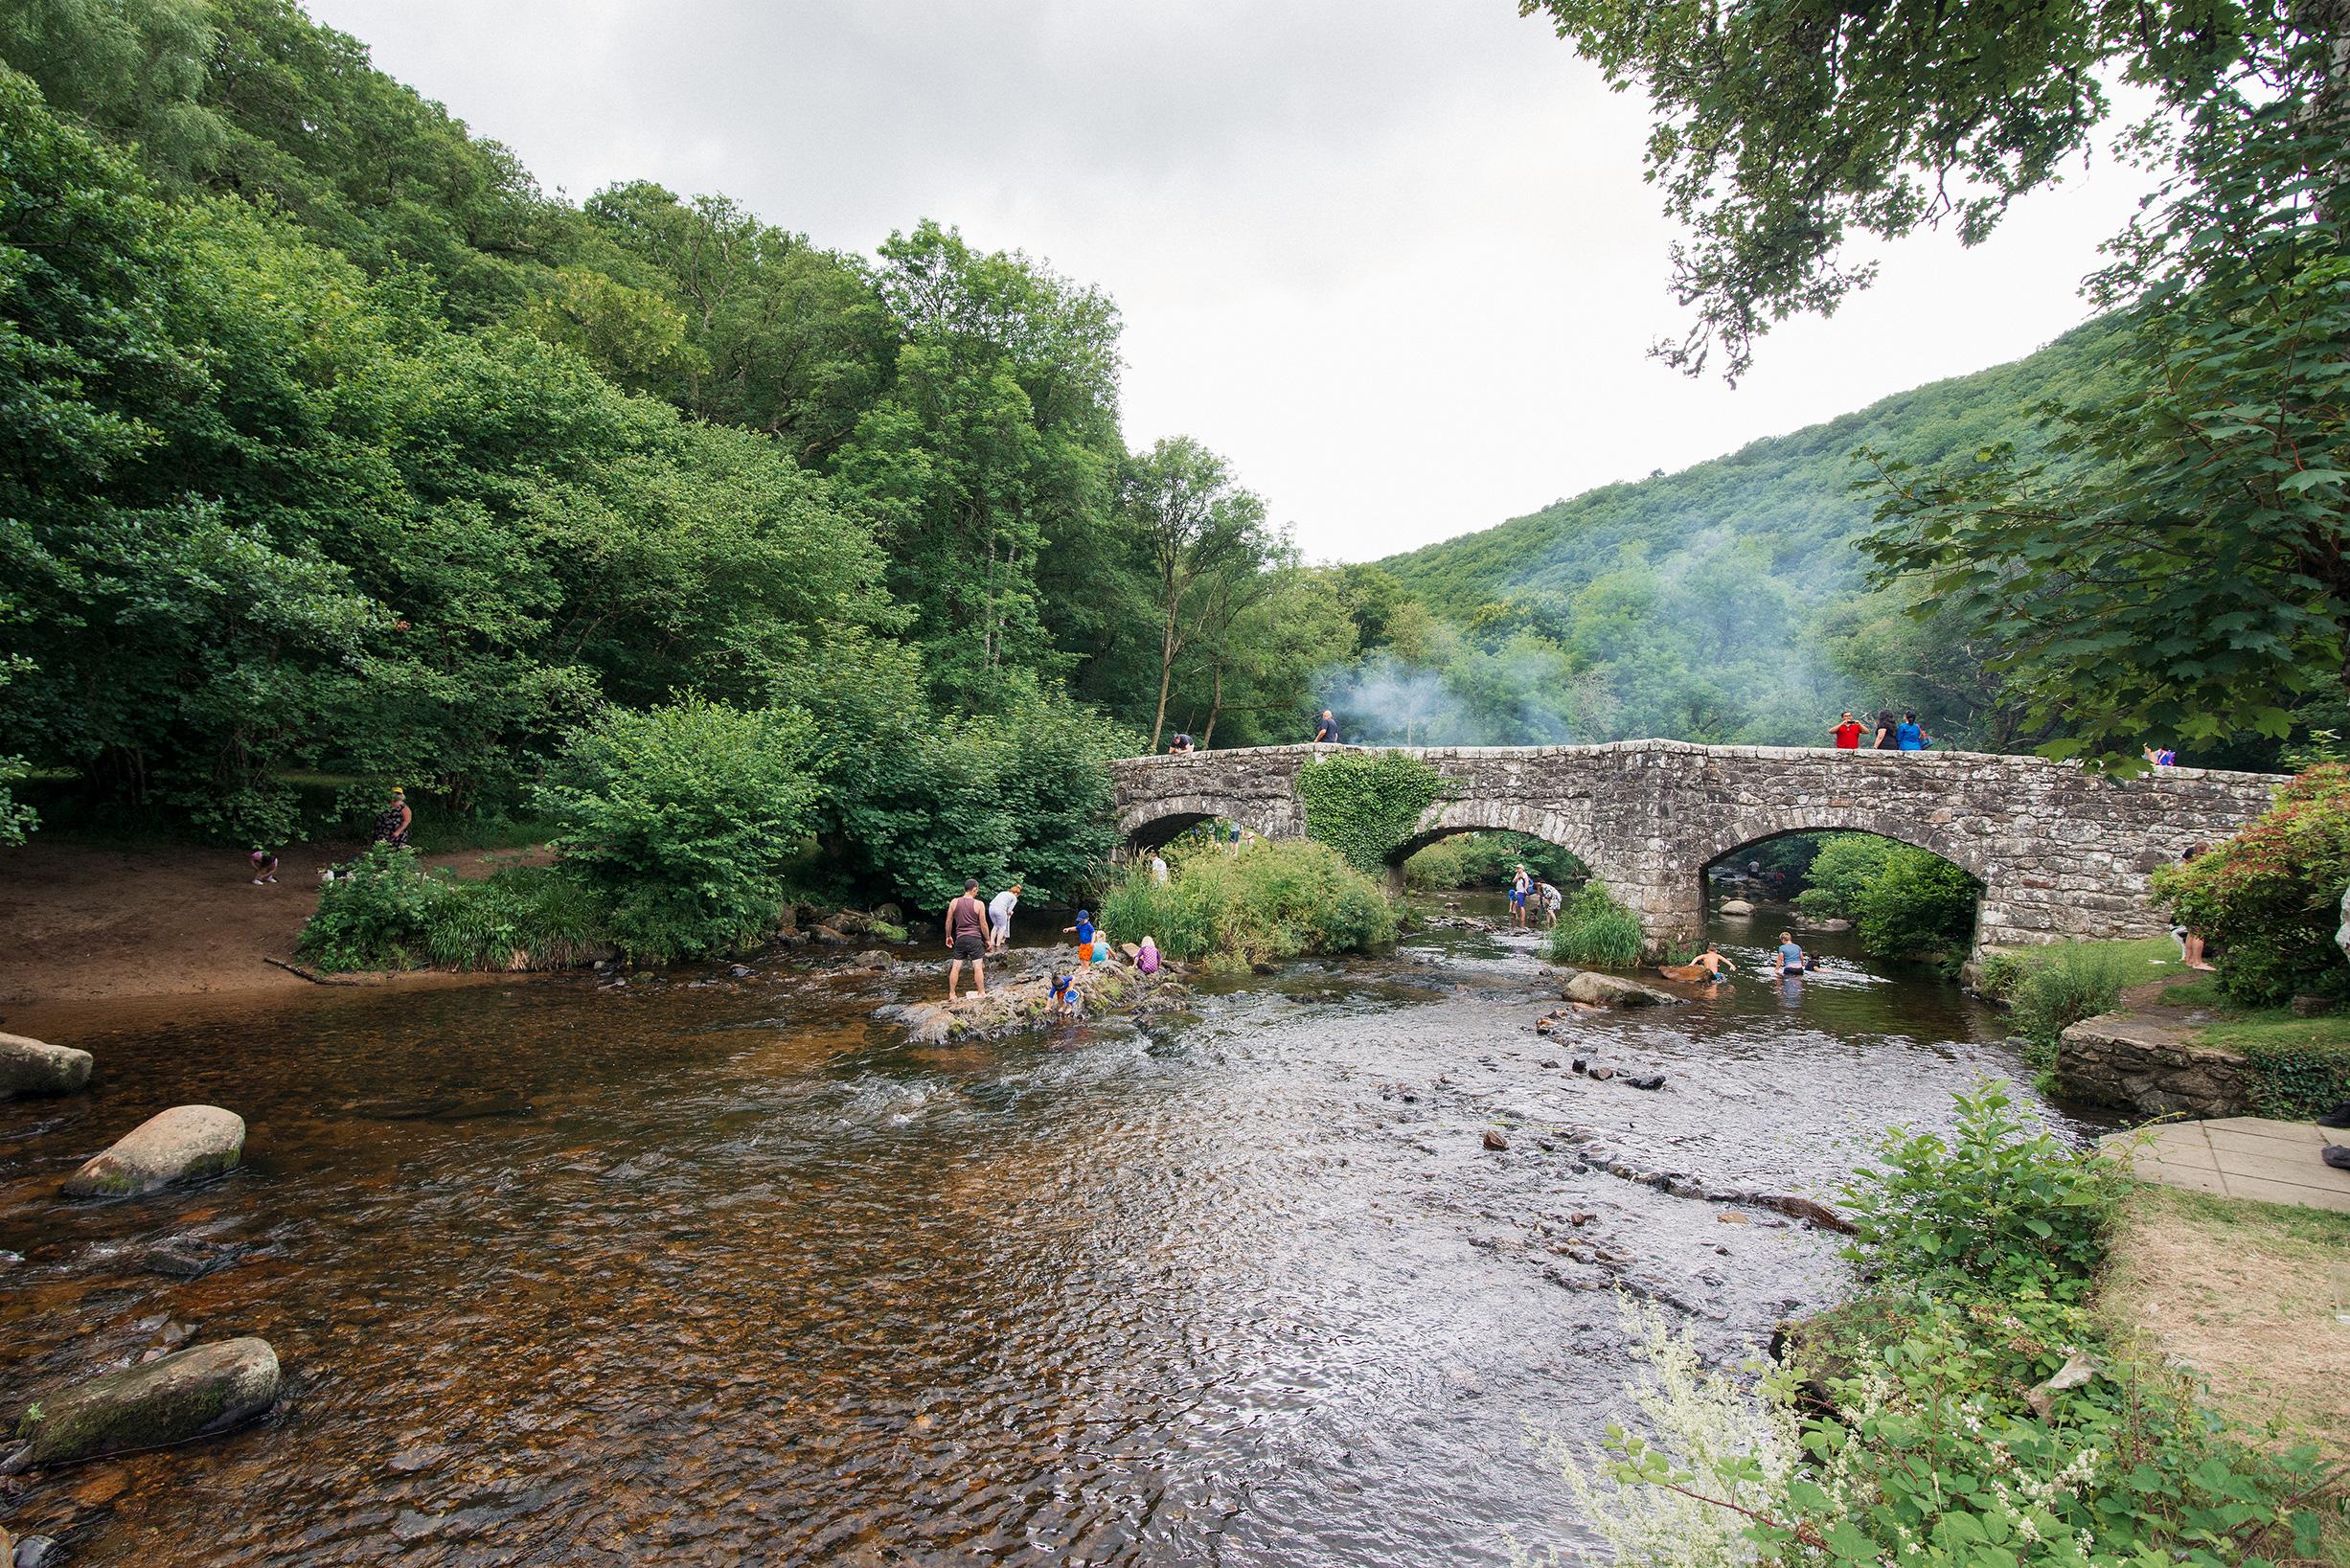 Fingle Bridge